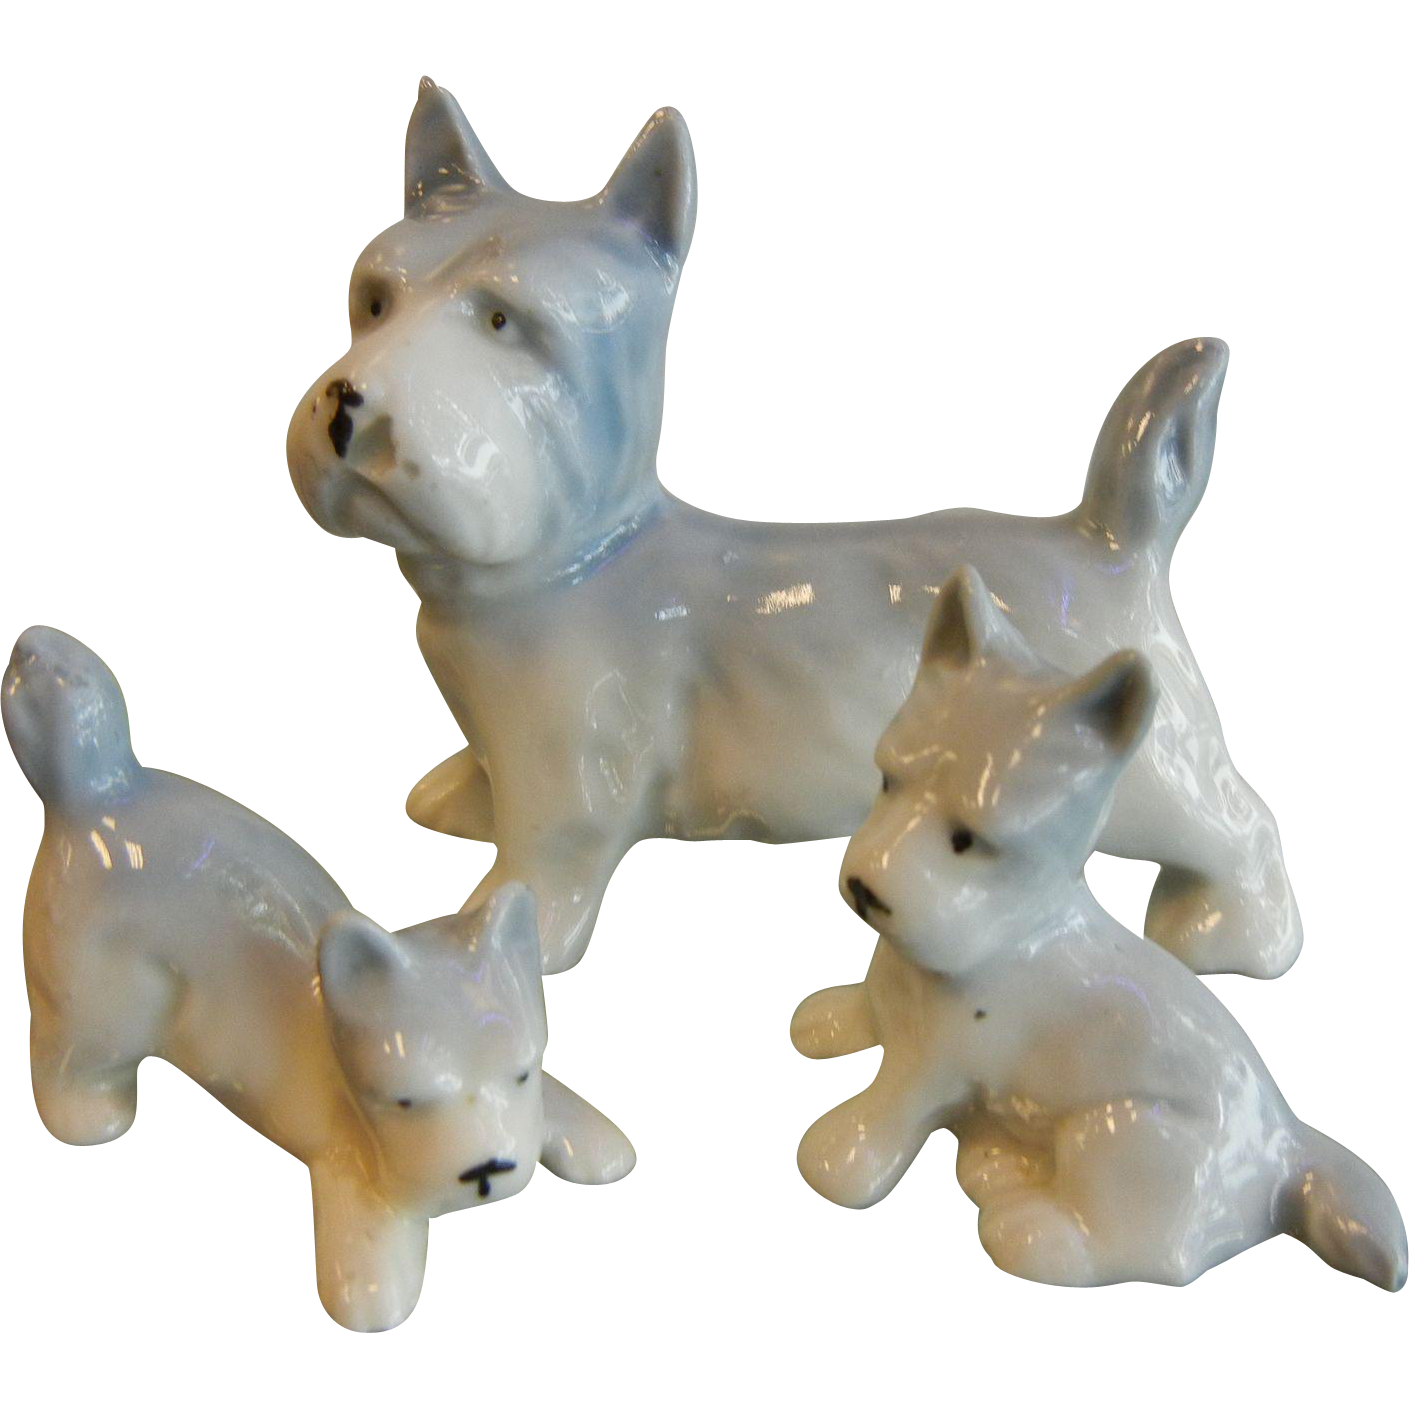 Adorable Vintage German Porcelain Figurines Trio of Terrier Dog Family